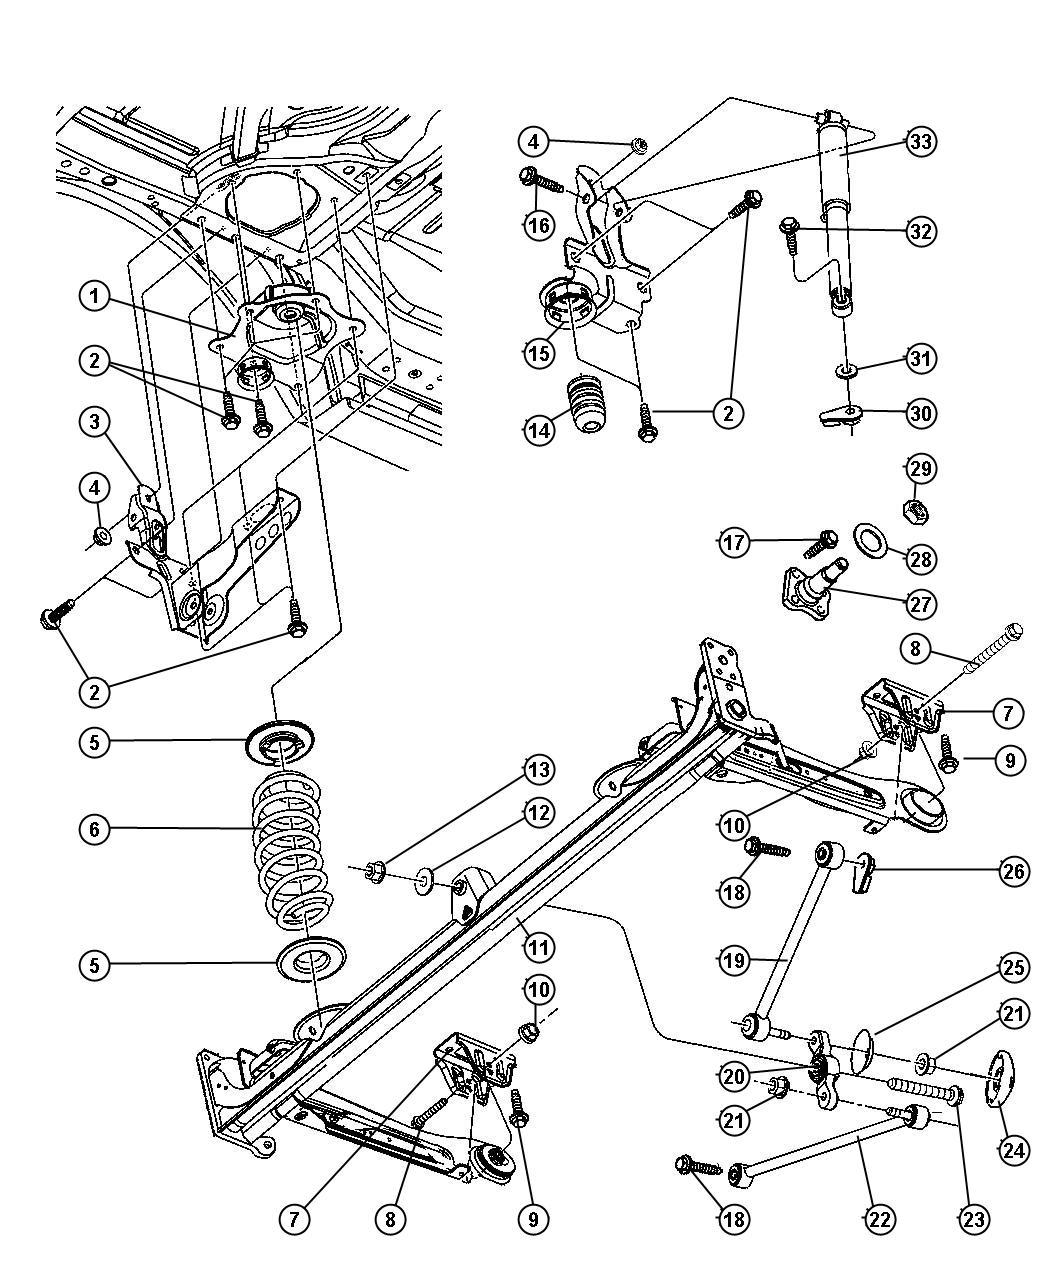 Chrysler concorde stereo wiring diagram chrysler wiring diagrams rh ww1 ww w freeautoresponder co chrysler pt